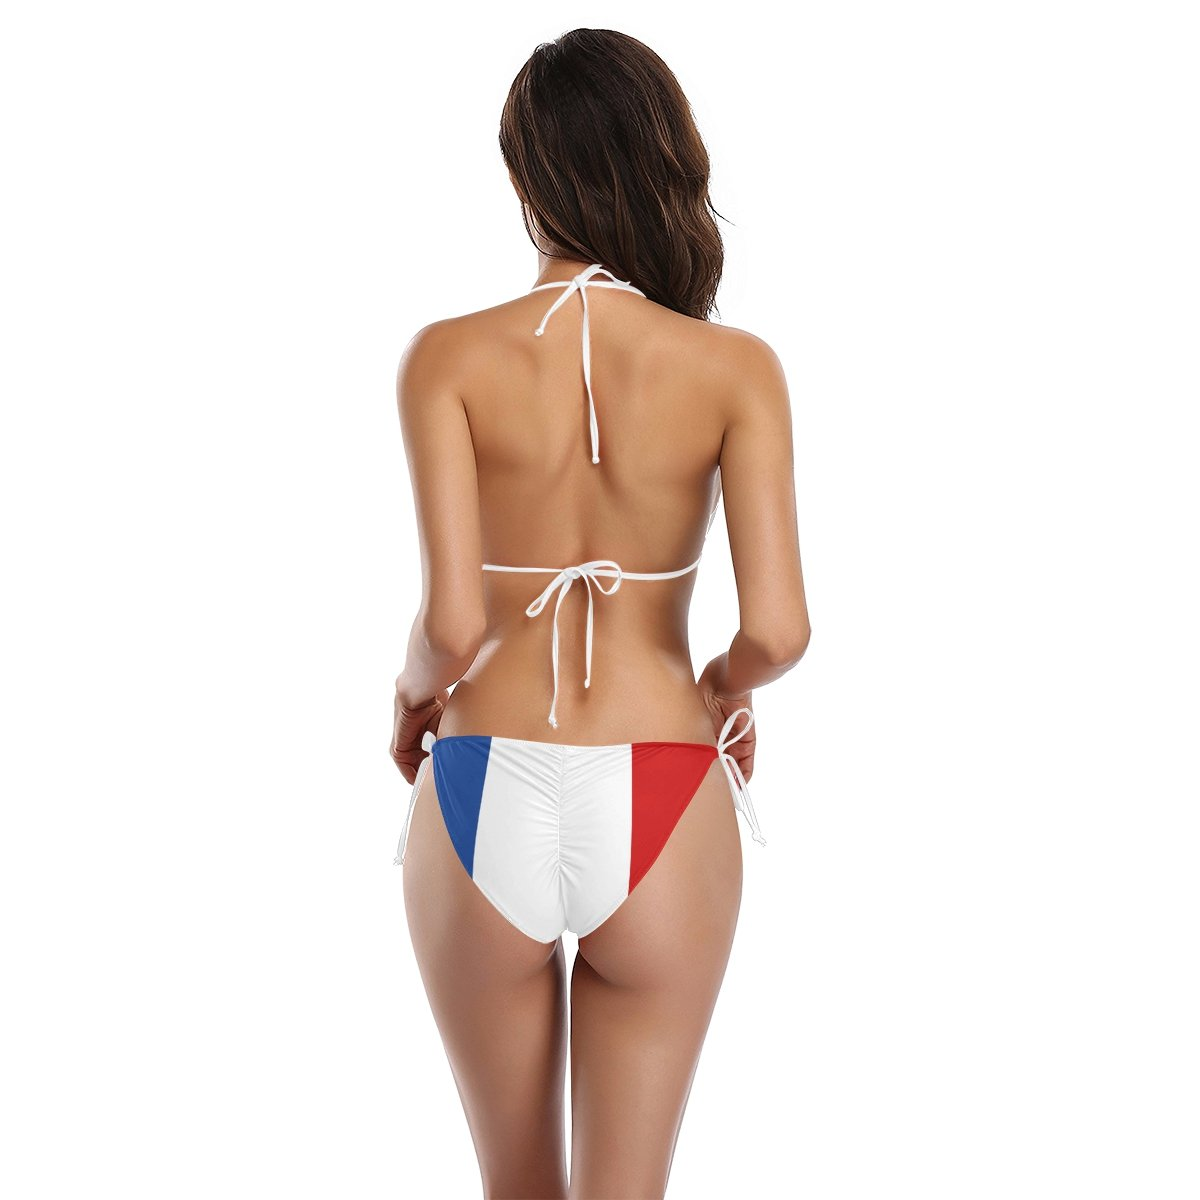 b16f4e18d64 Amazon.com: Naanle France Flag Patriotic Icon Sexy Two Piece Bikini  Swimsuit Swimwear Set for Women: Clothing